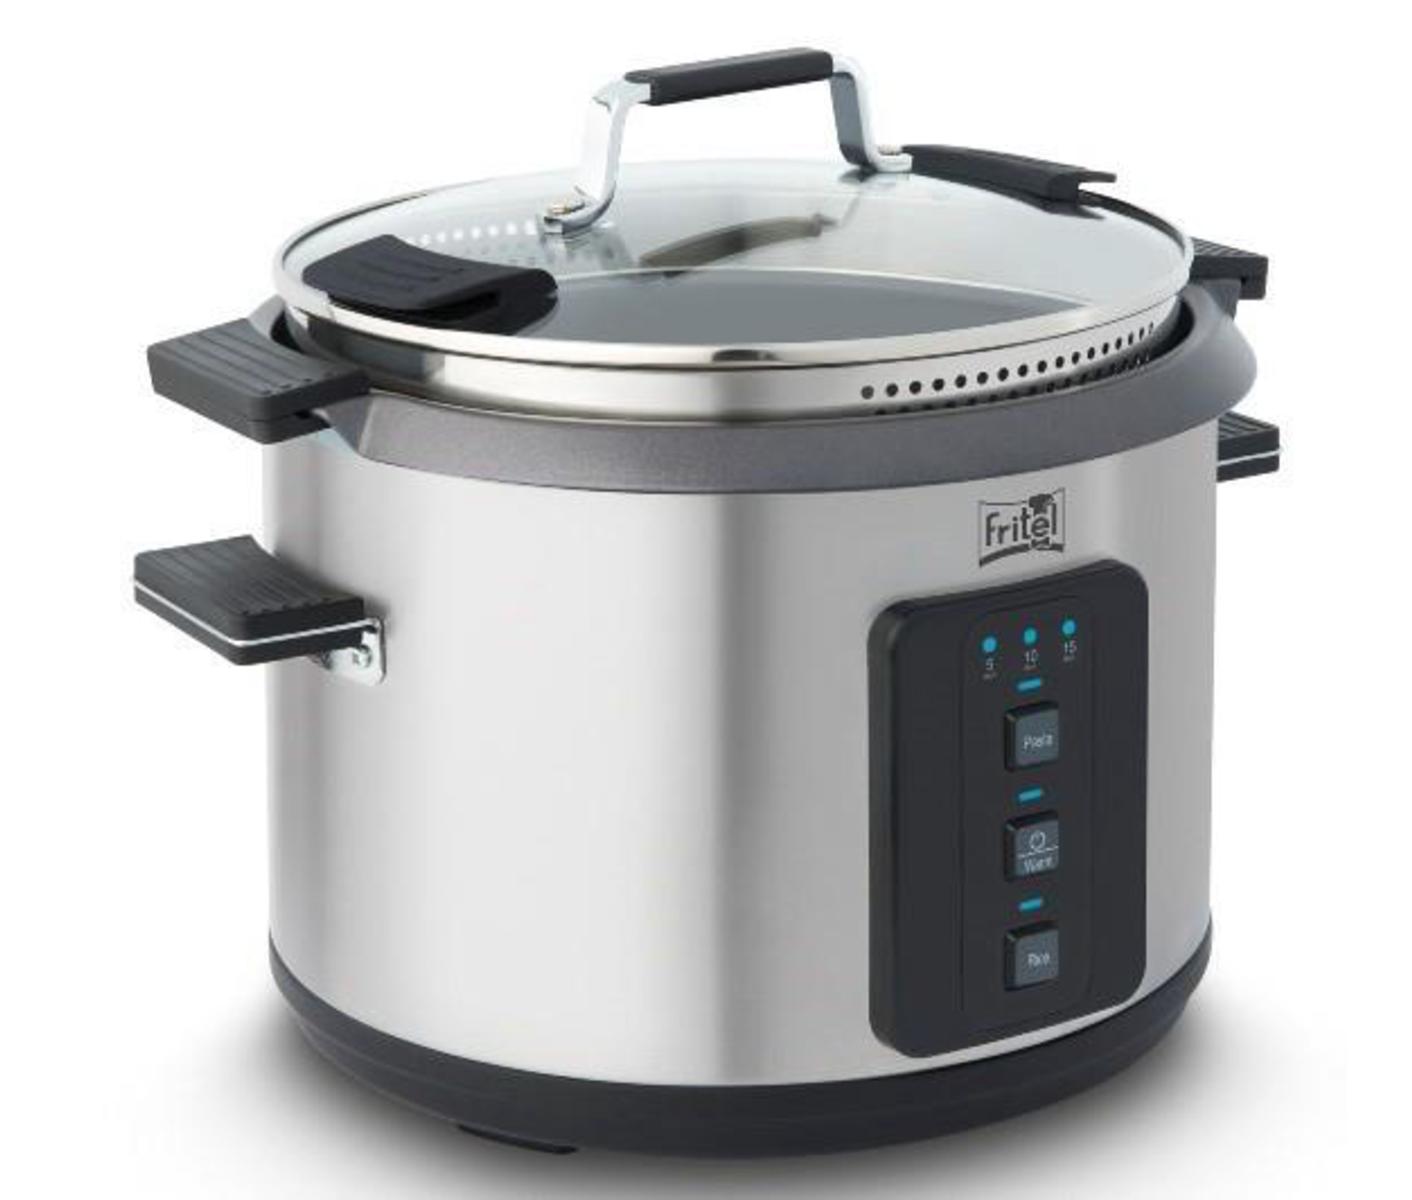 Fritel - RC 1377 Rice & Pasta Cooker